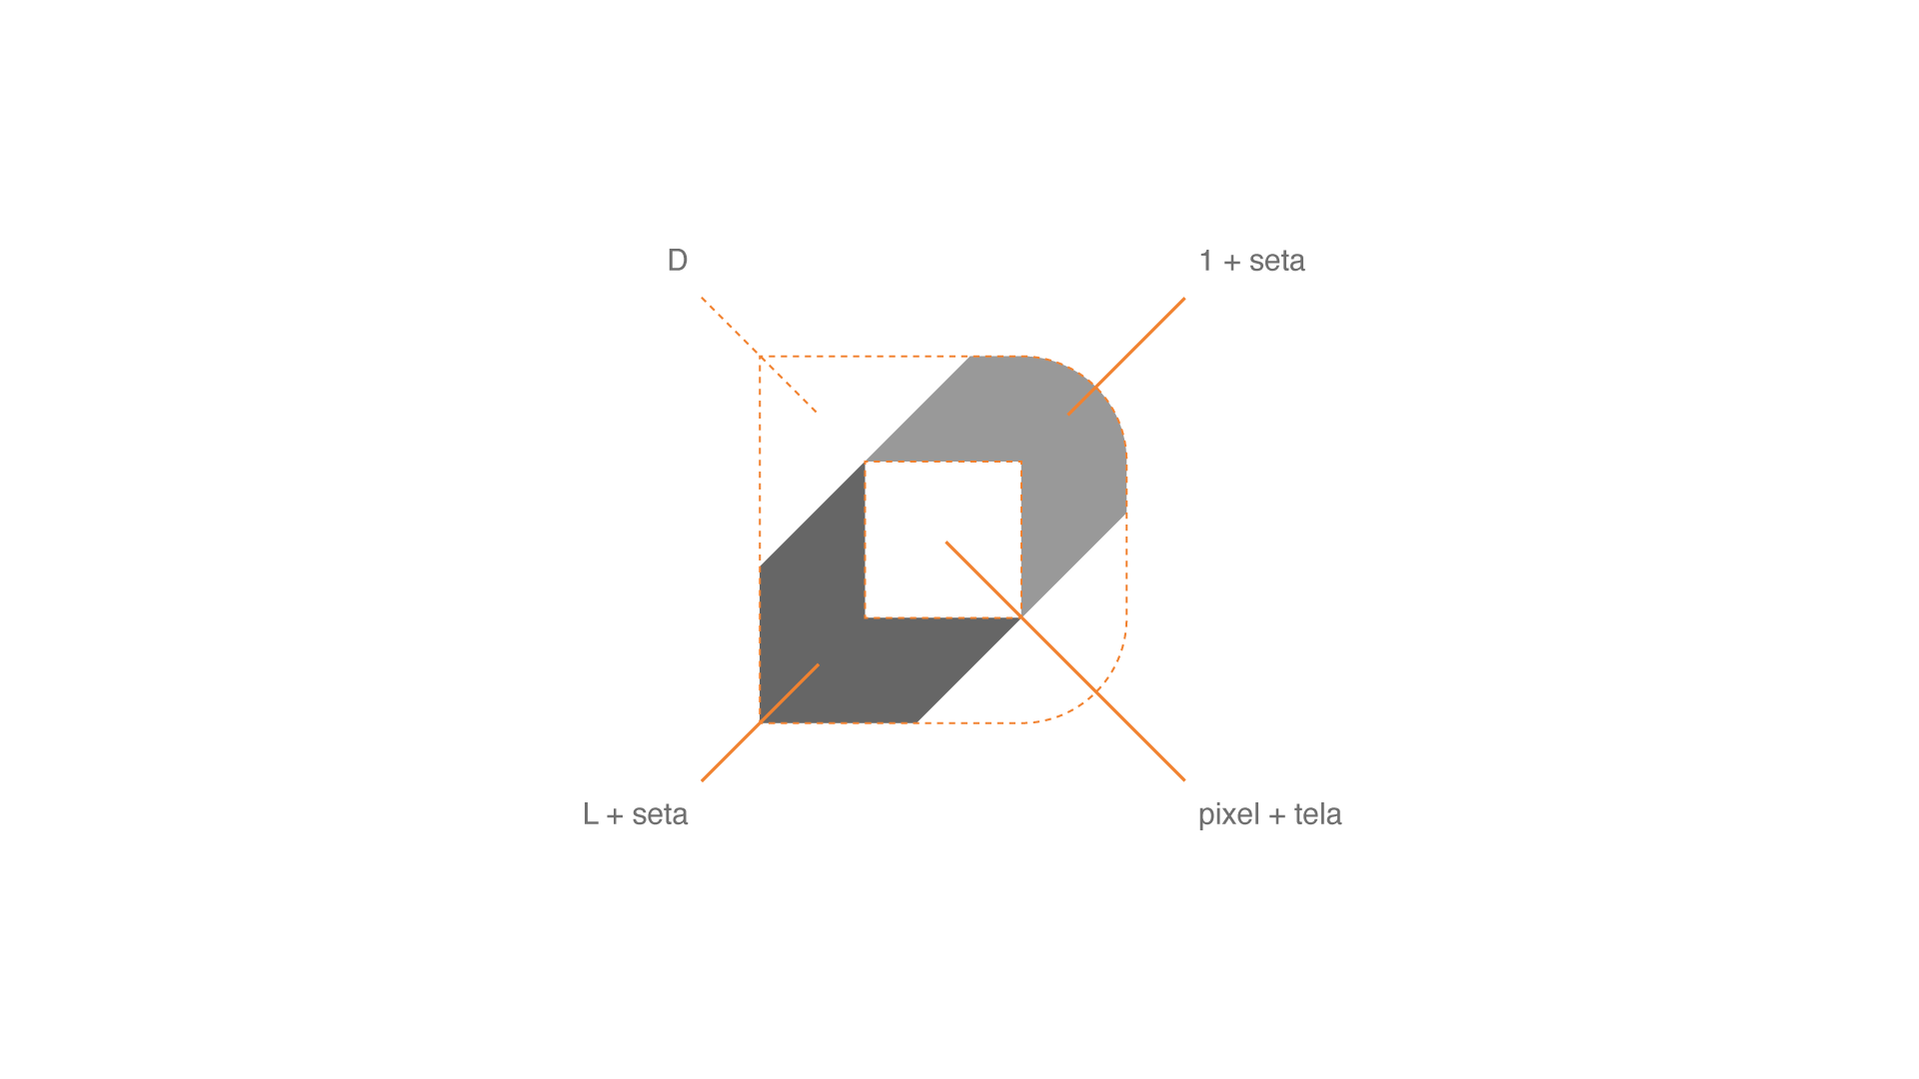 leaddata_simbolo_1.png